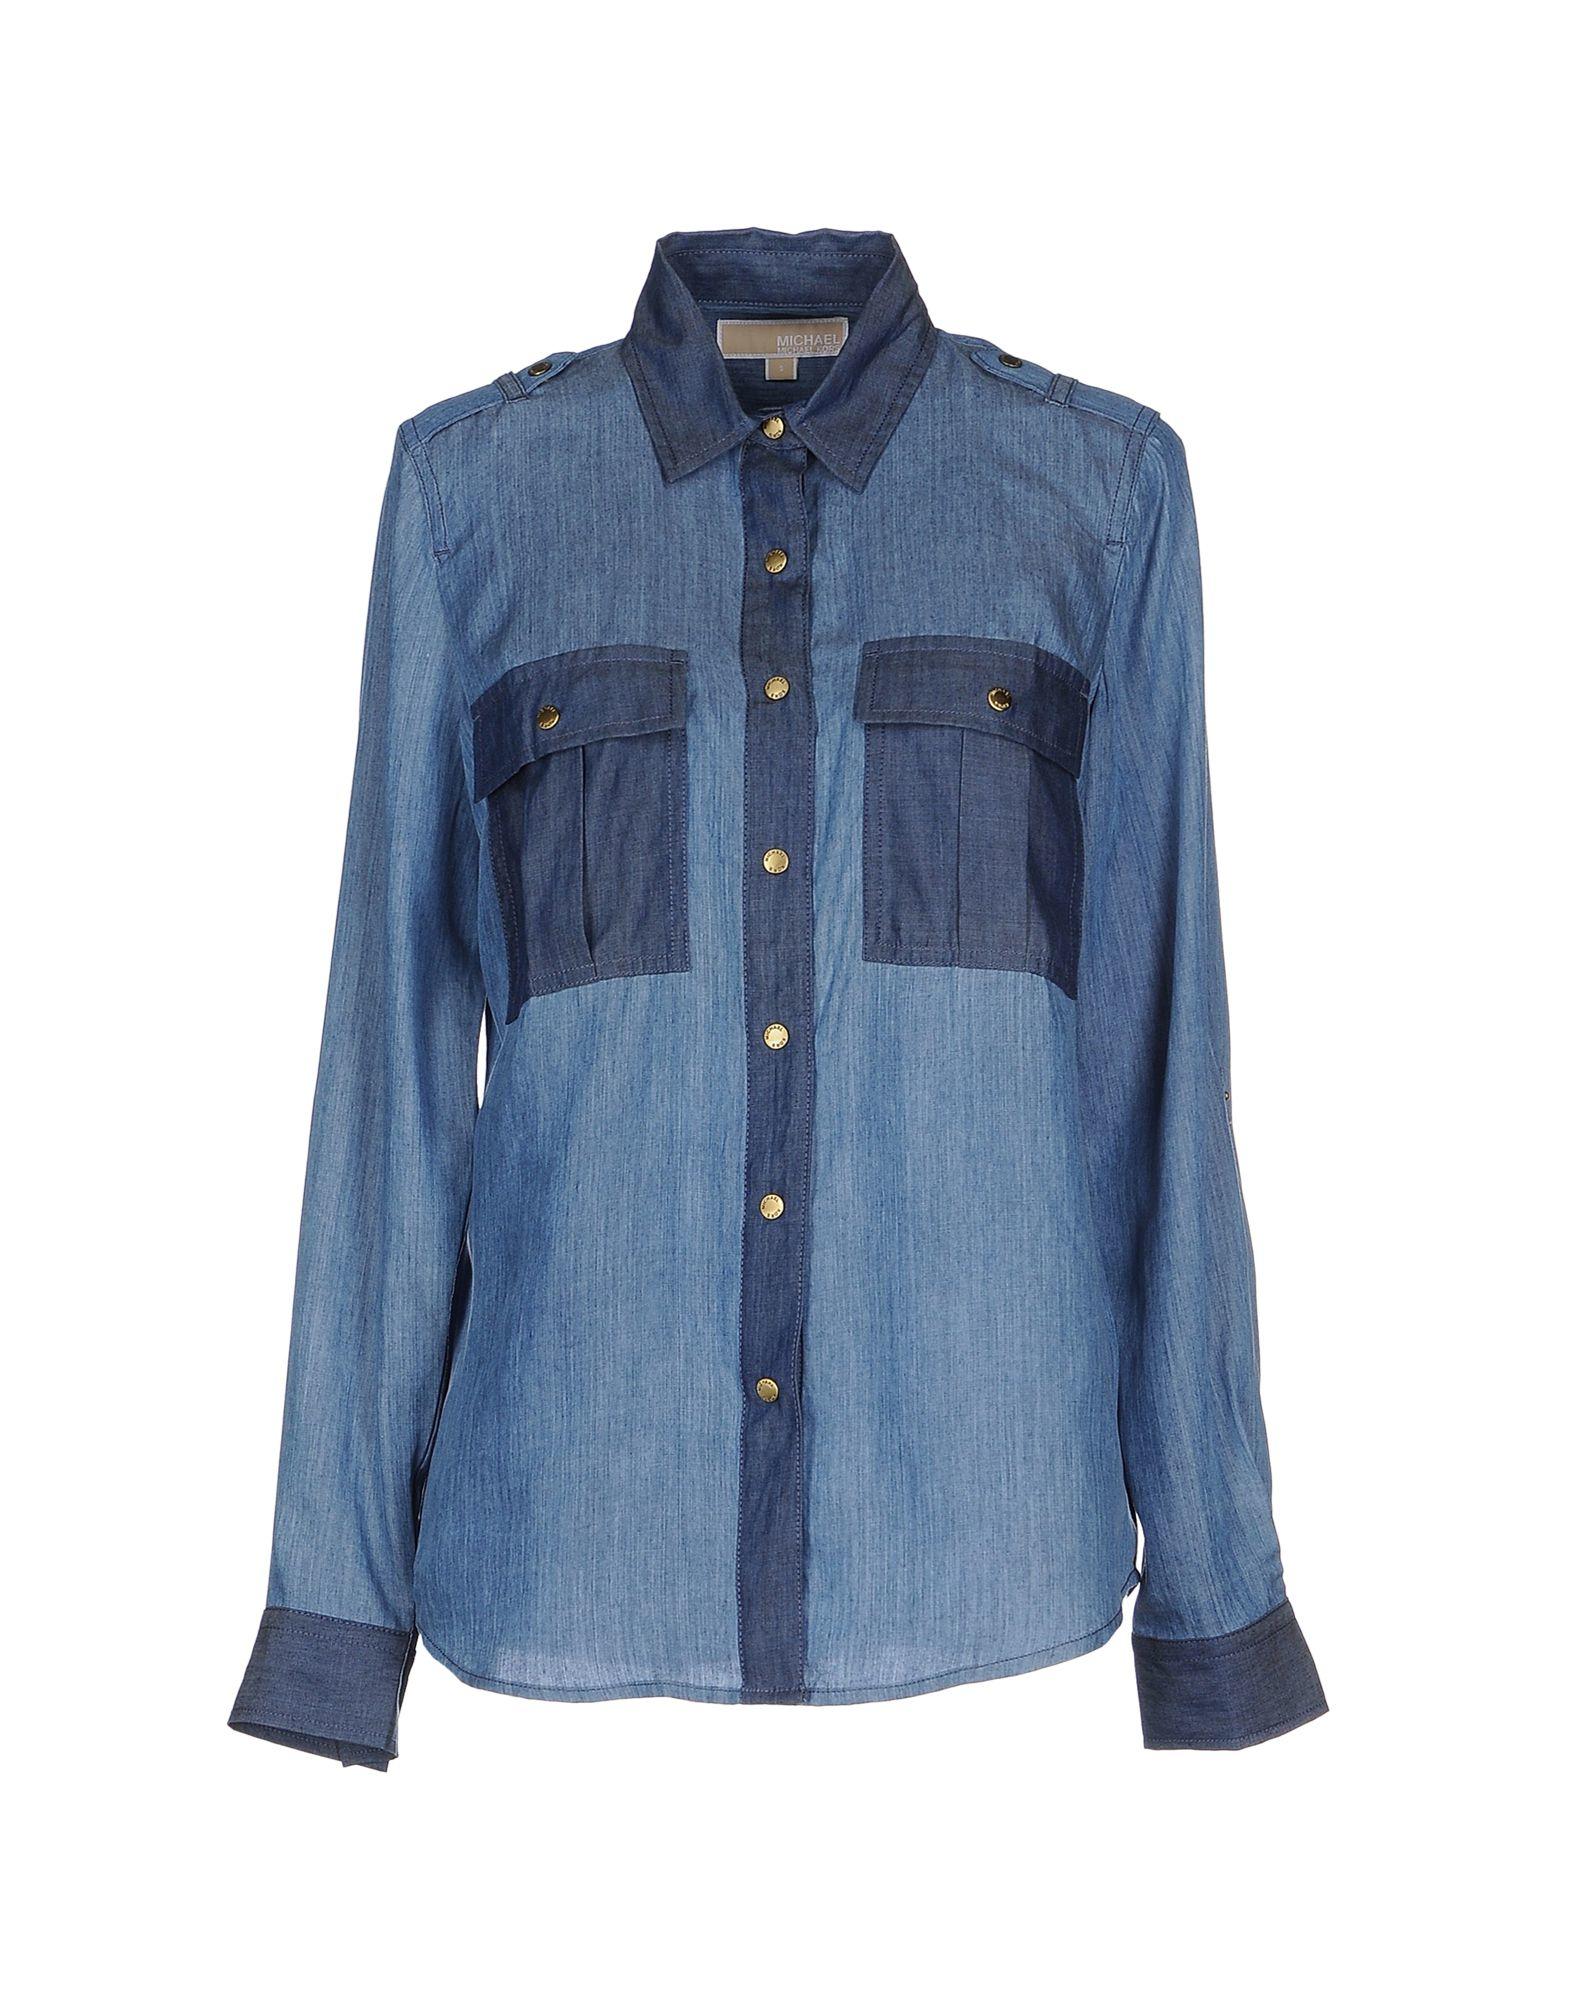 michael michael kors denim shirt in blue lyst. Black Bedroom Furniture Sets. Home Design Ideas